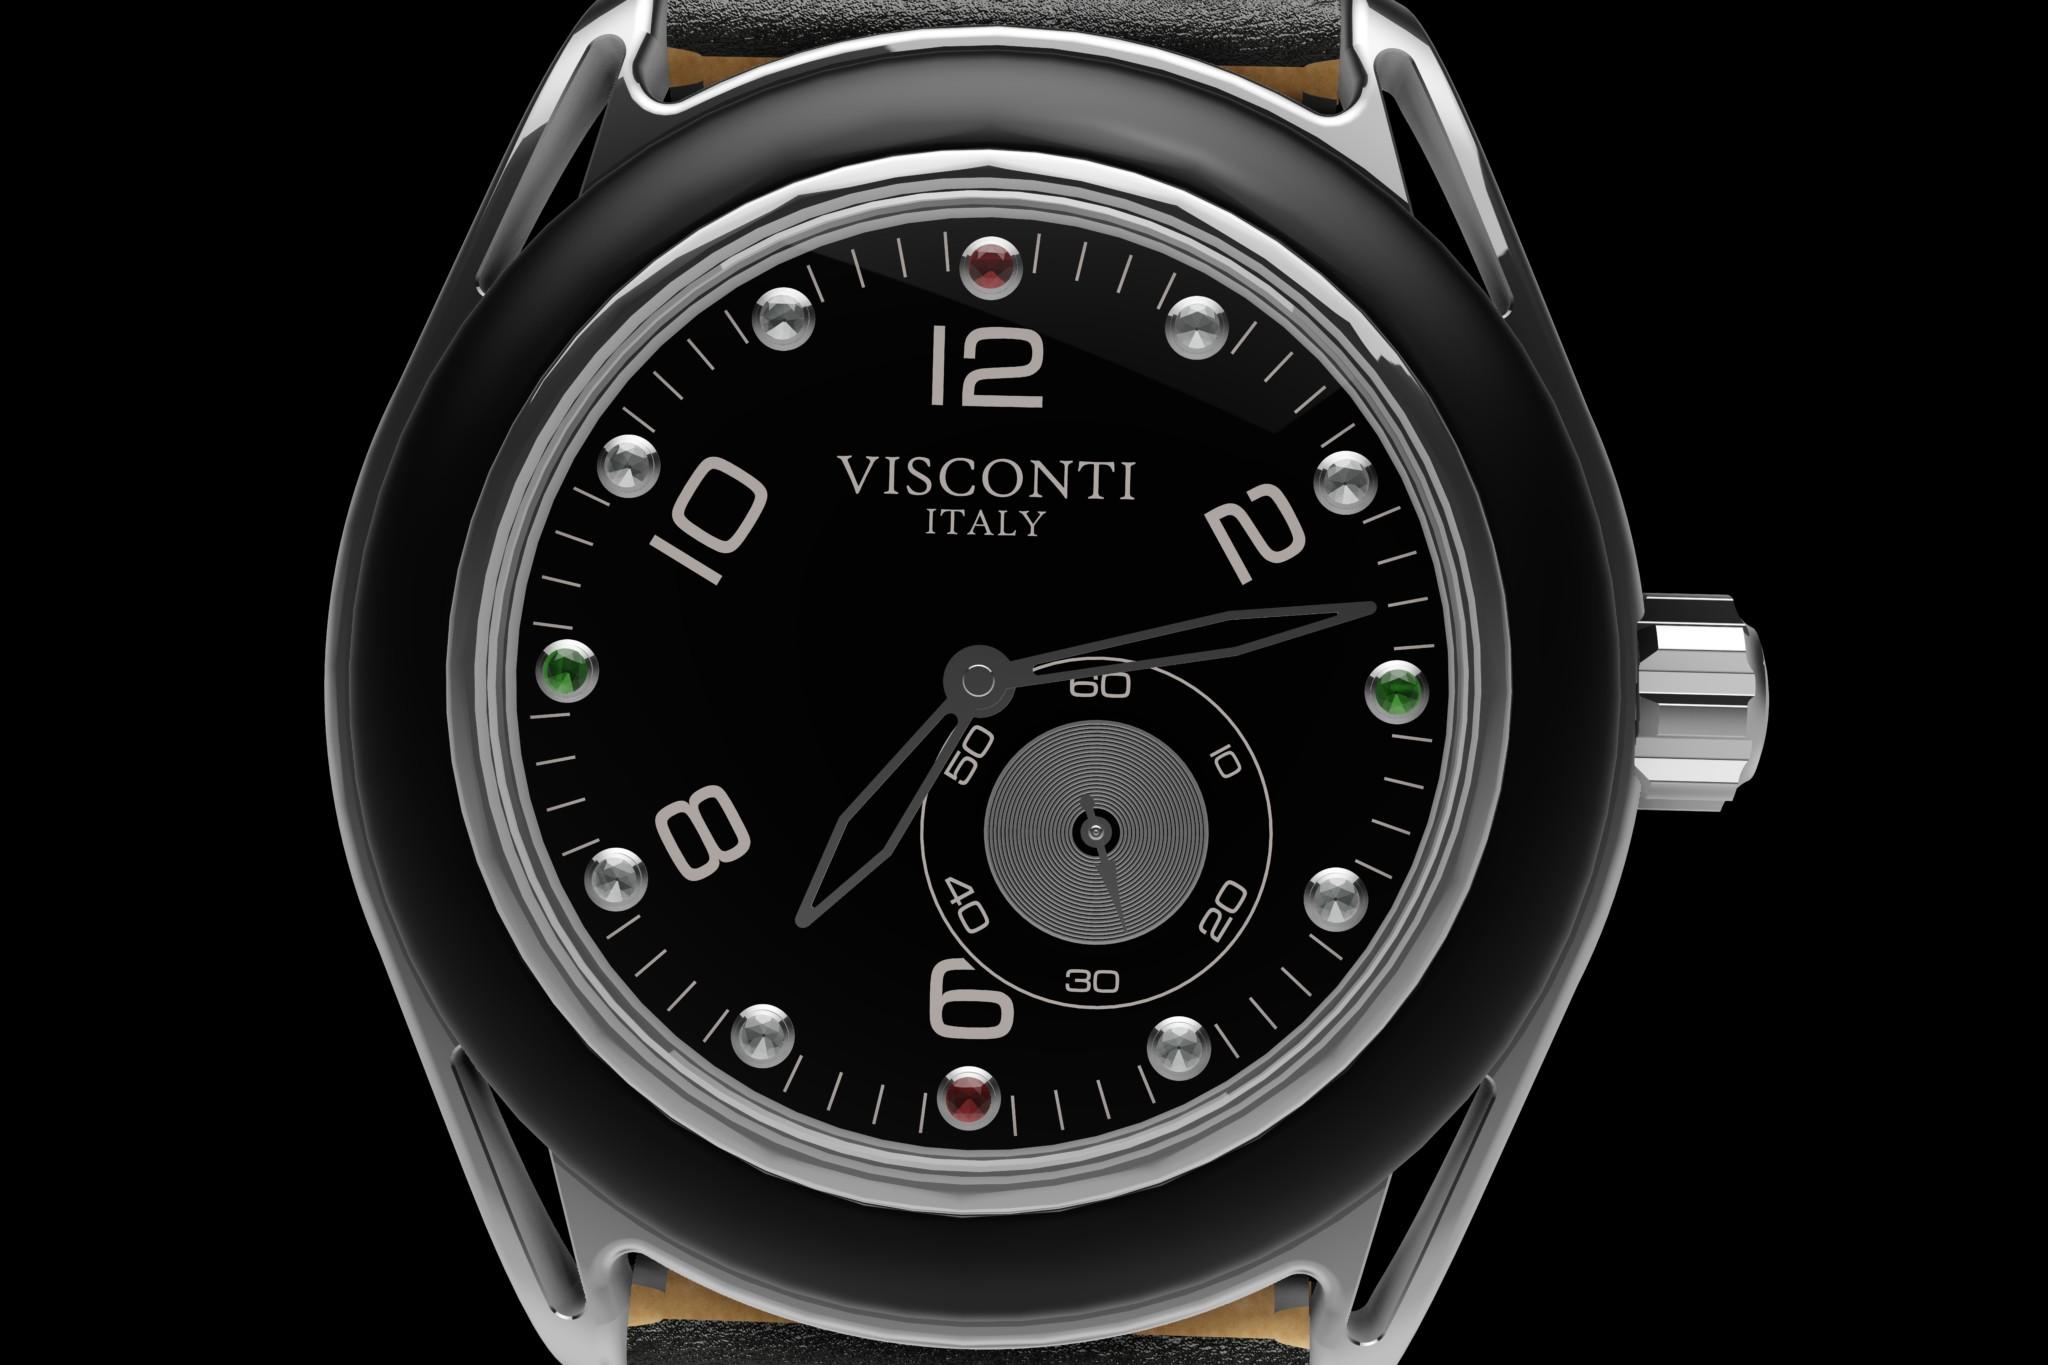 Visconti's Lava watch.